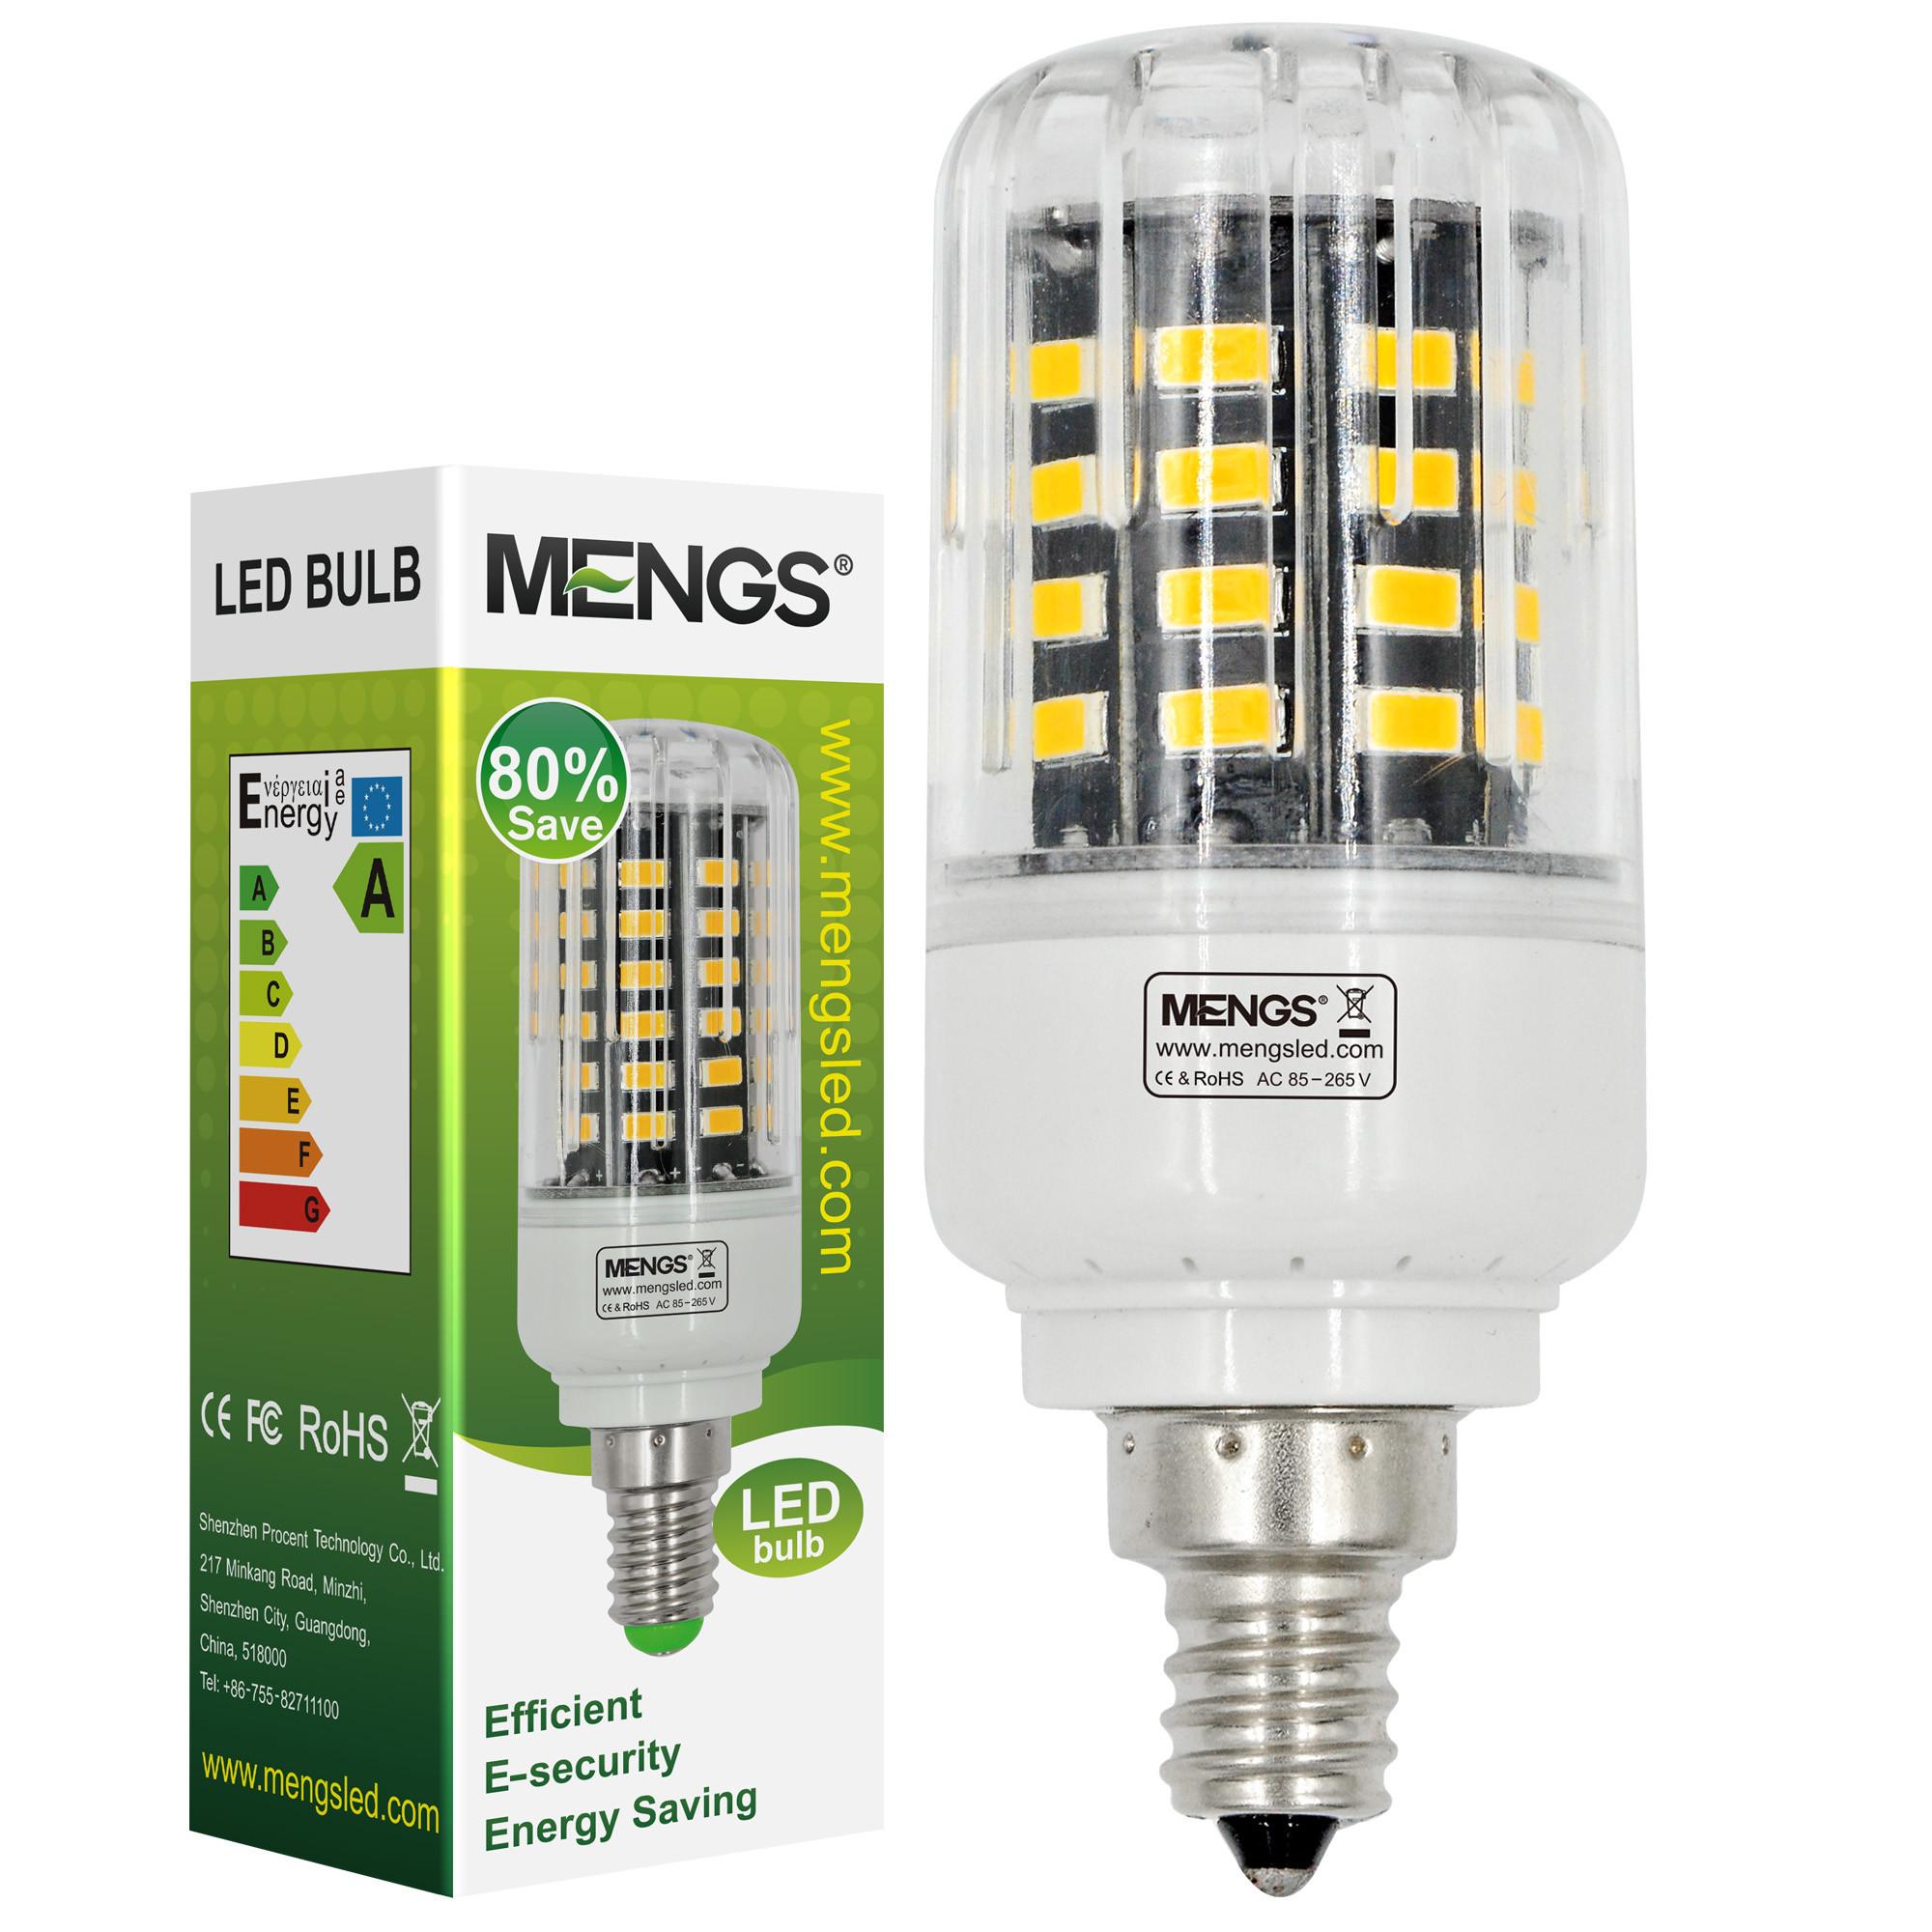 MENGS® Anti-Strobe E12 5W LED Corn Light 40x 5736 SMD LED Bulb Lamp In Warm White Energy-Saving Lamp